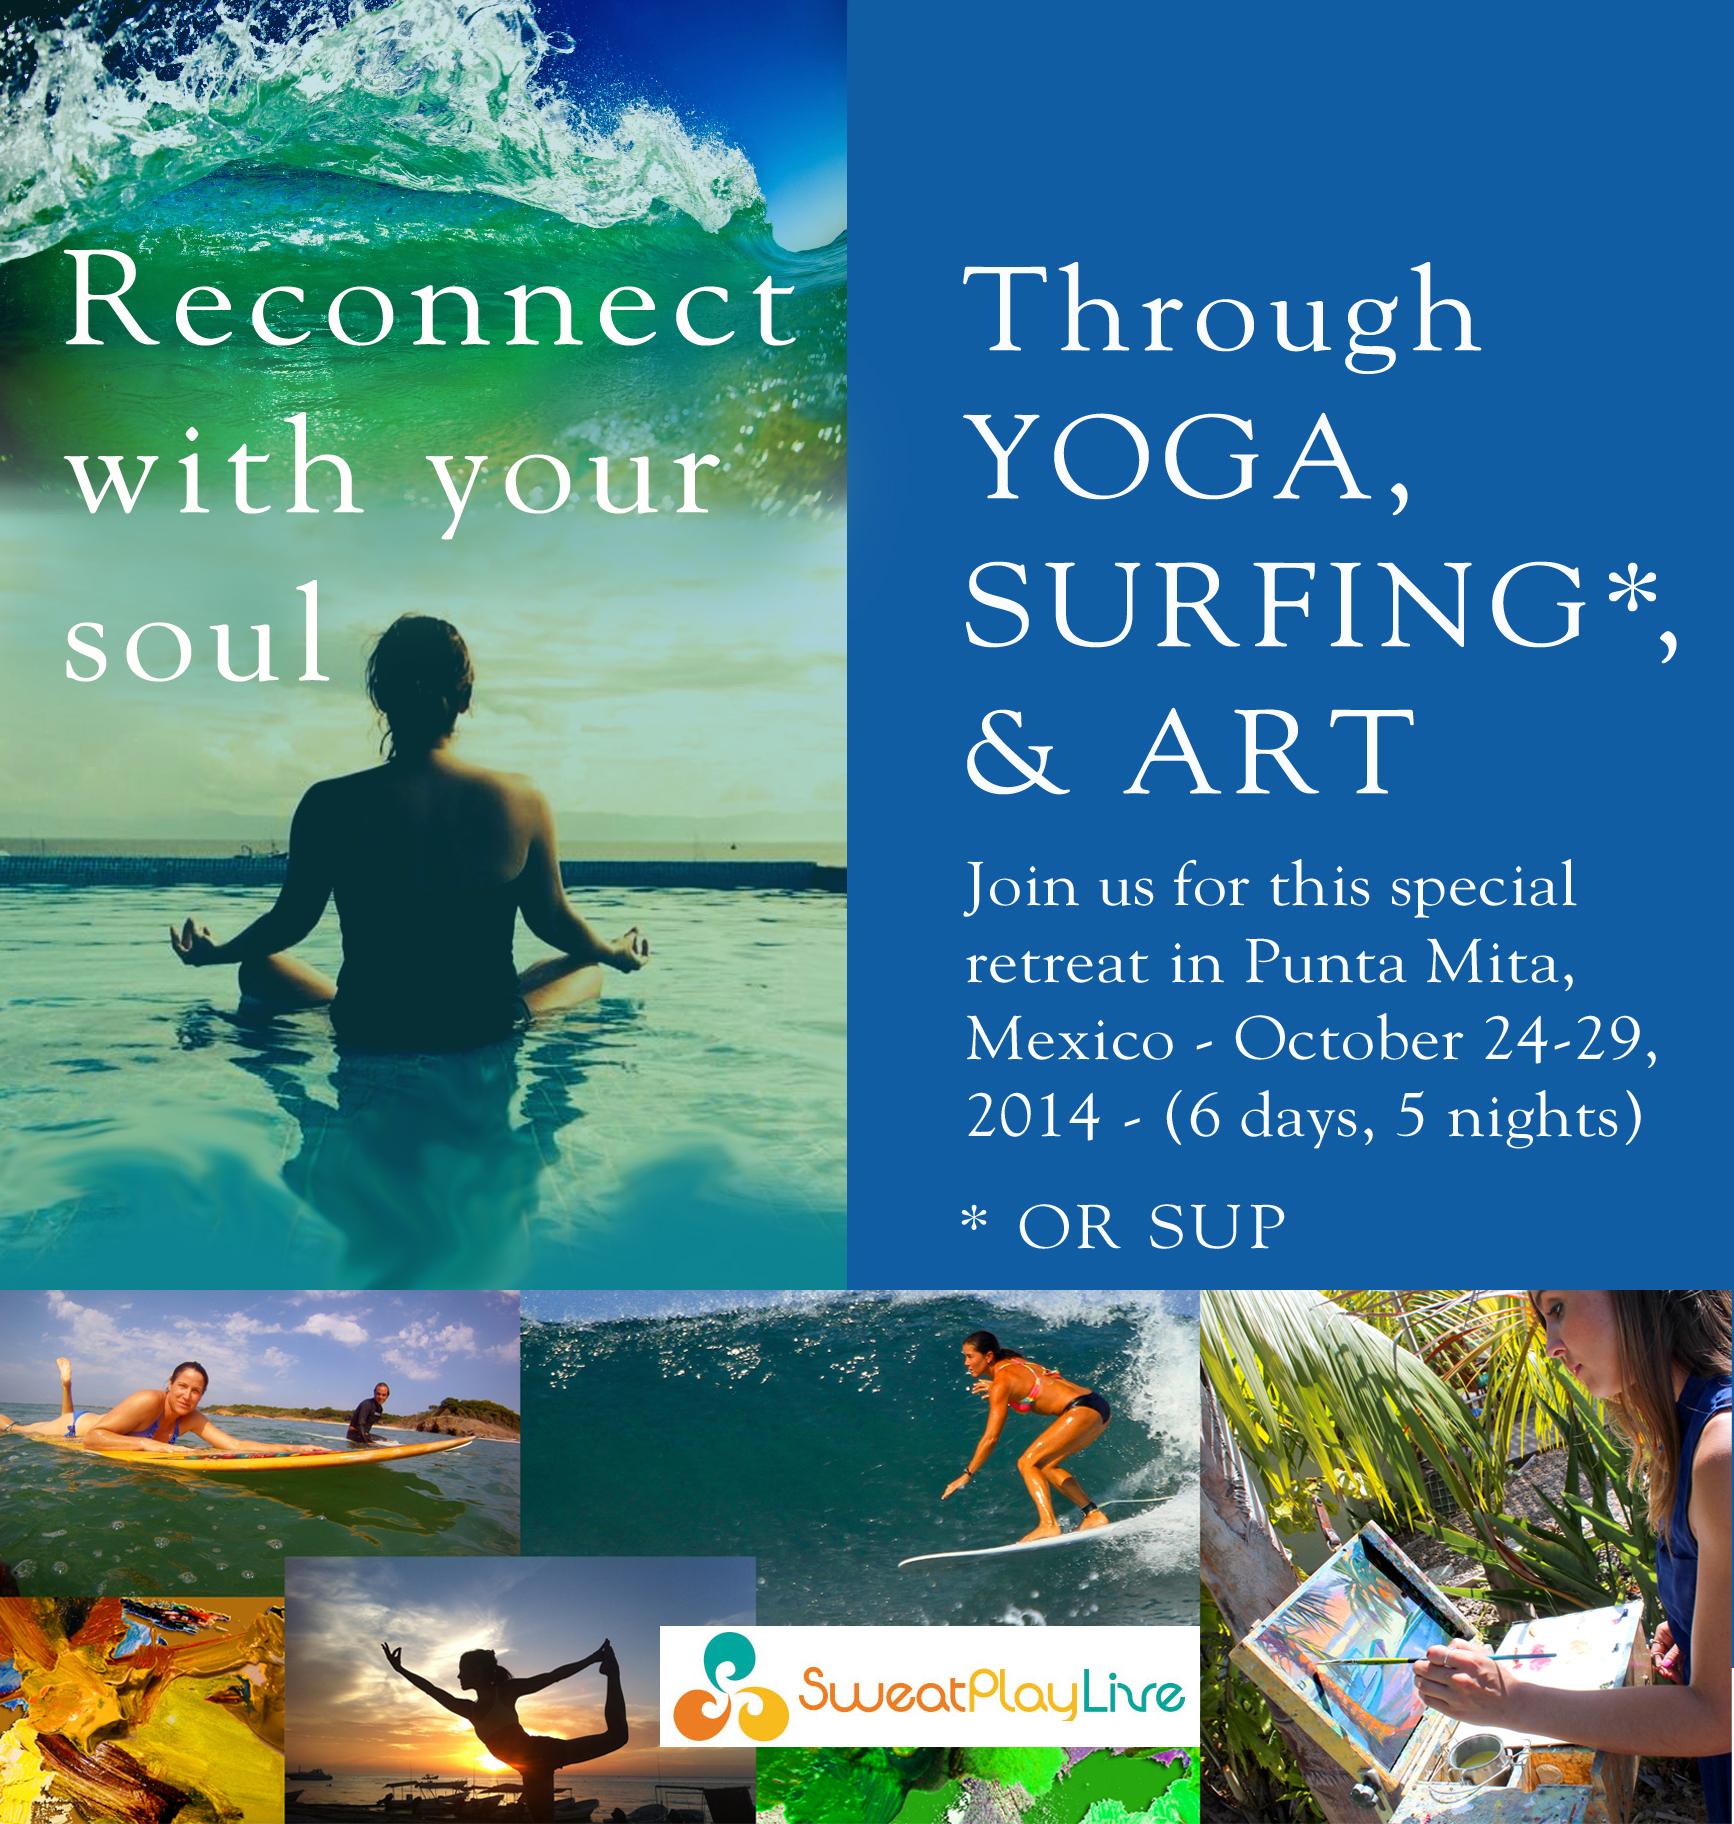 Mexico Surf, Art, Yoga Retreat